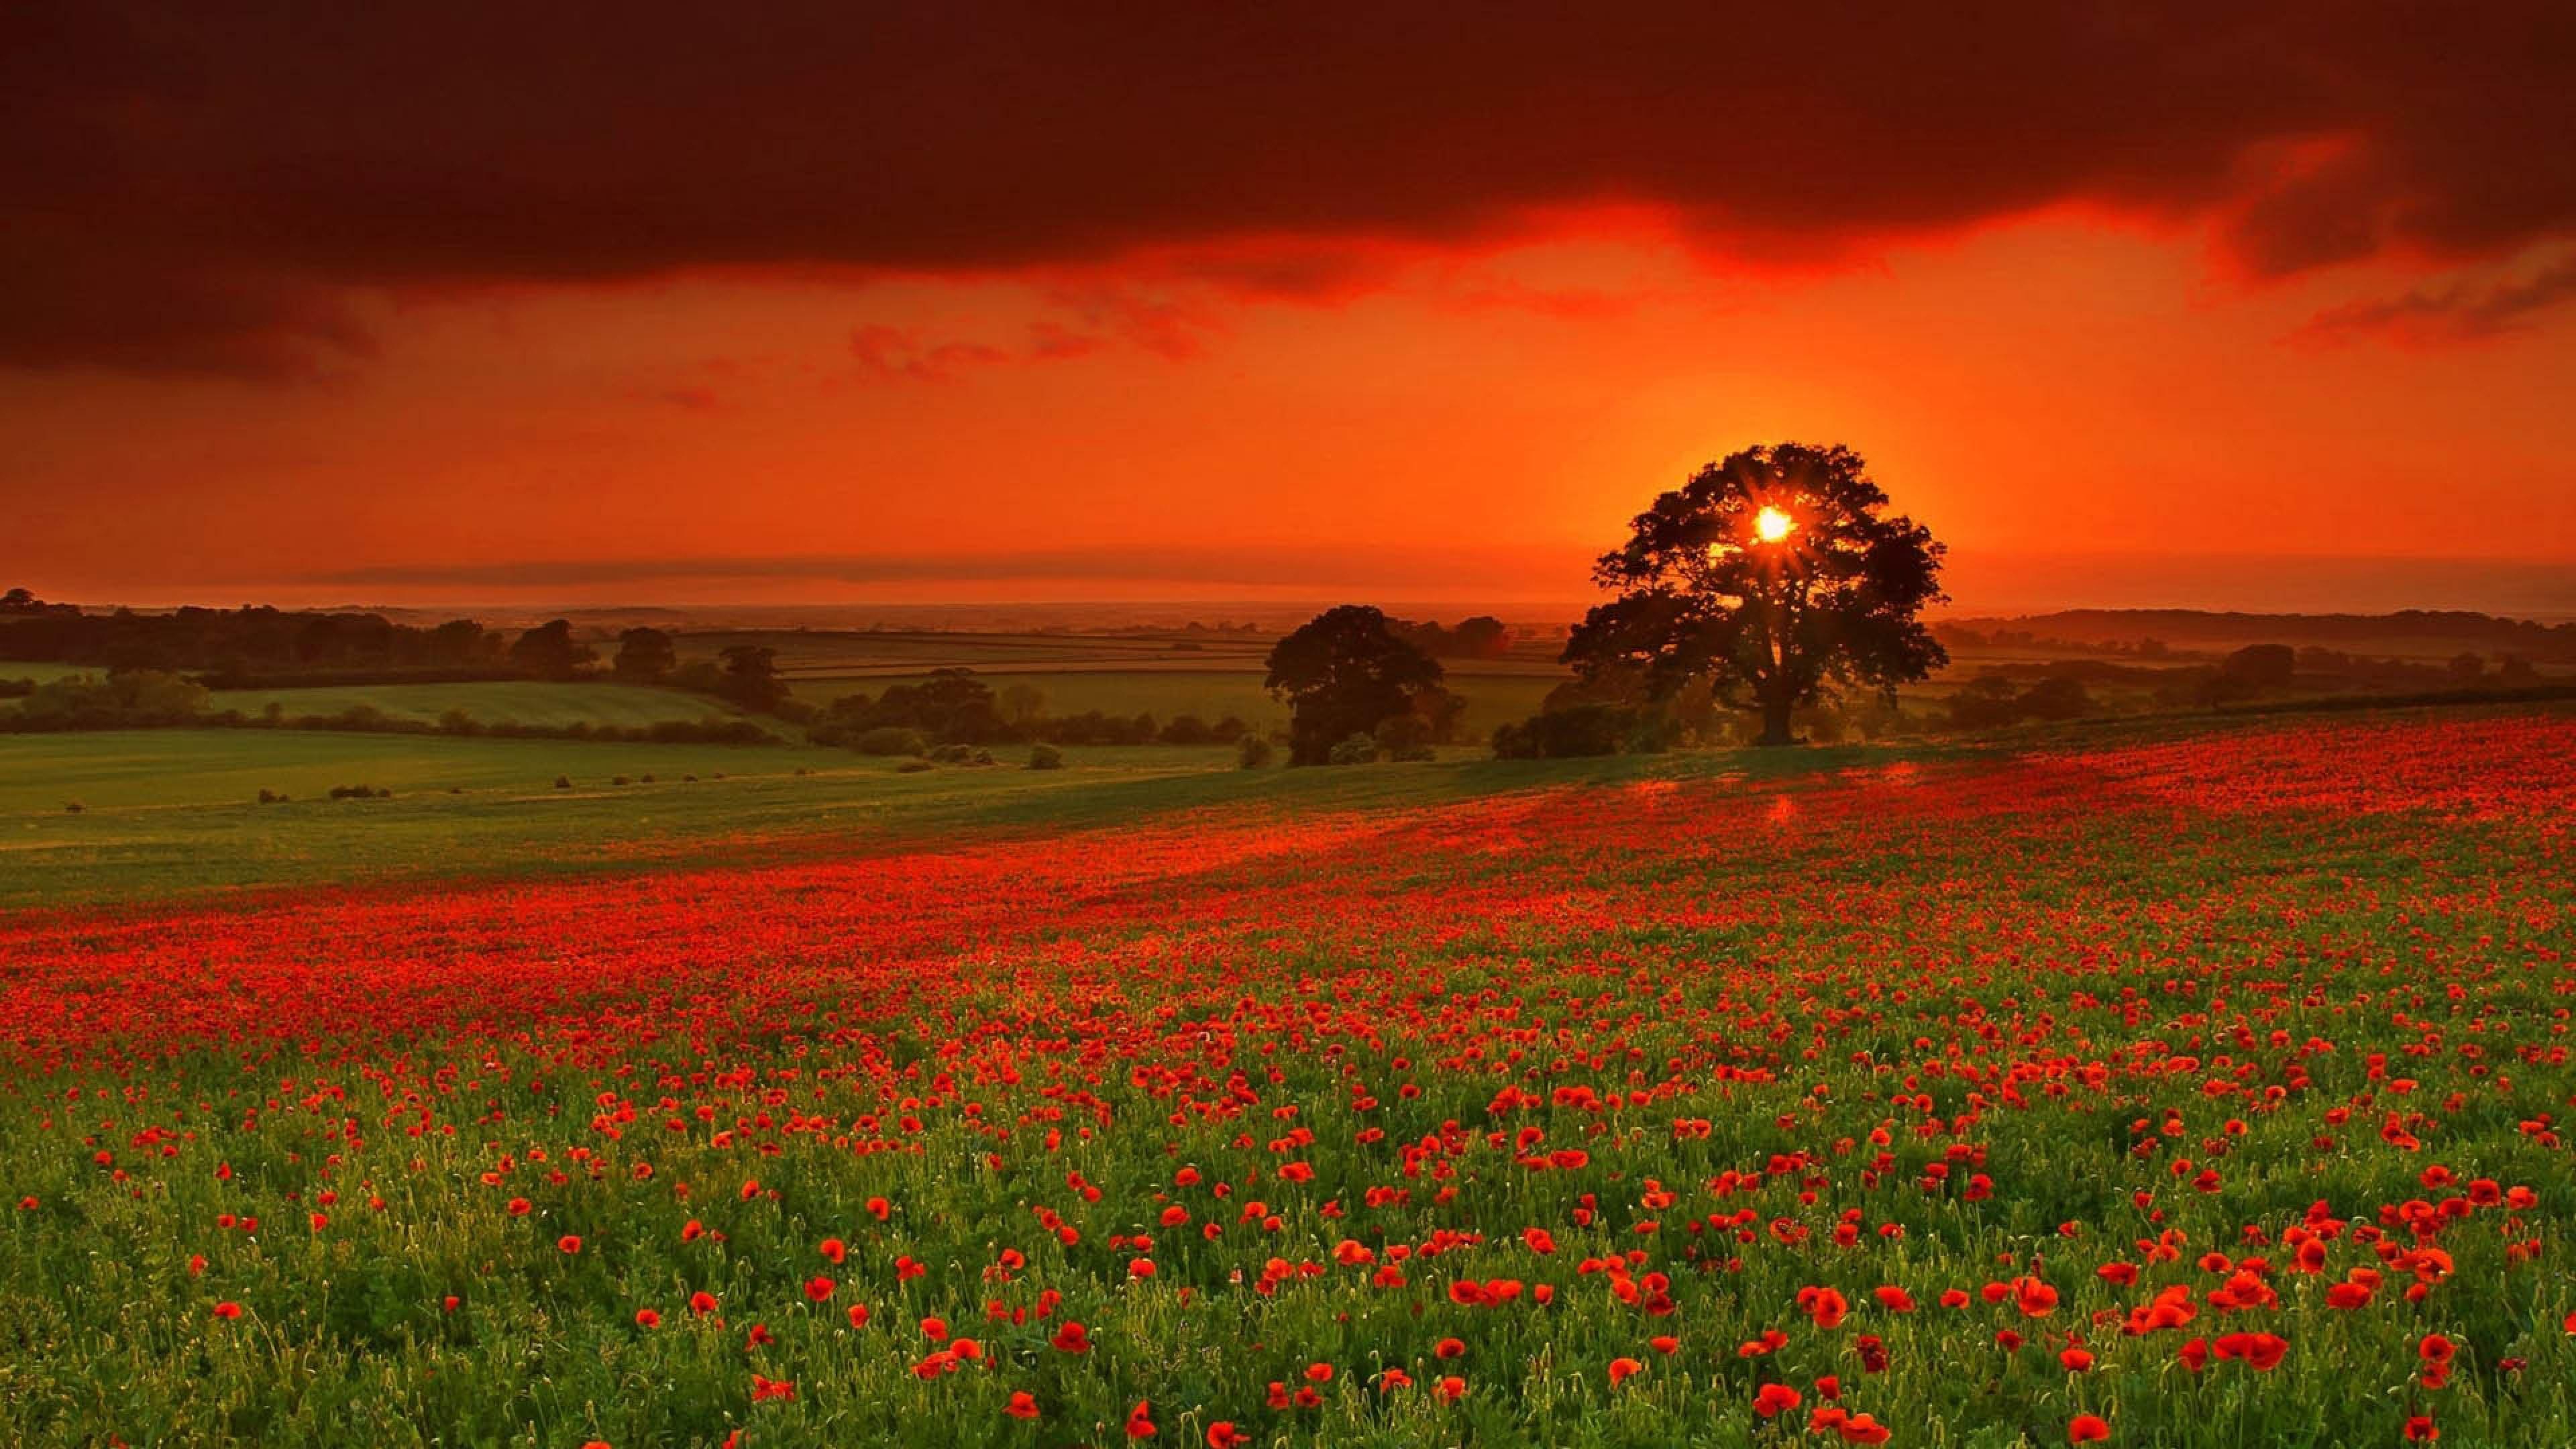 Autumn Sun Flowers Orange Red Wallpaper Background 4K Ultra HD 3840x2160